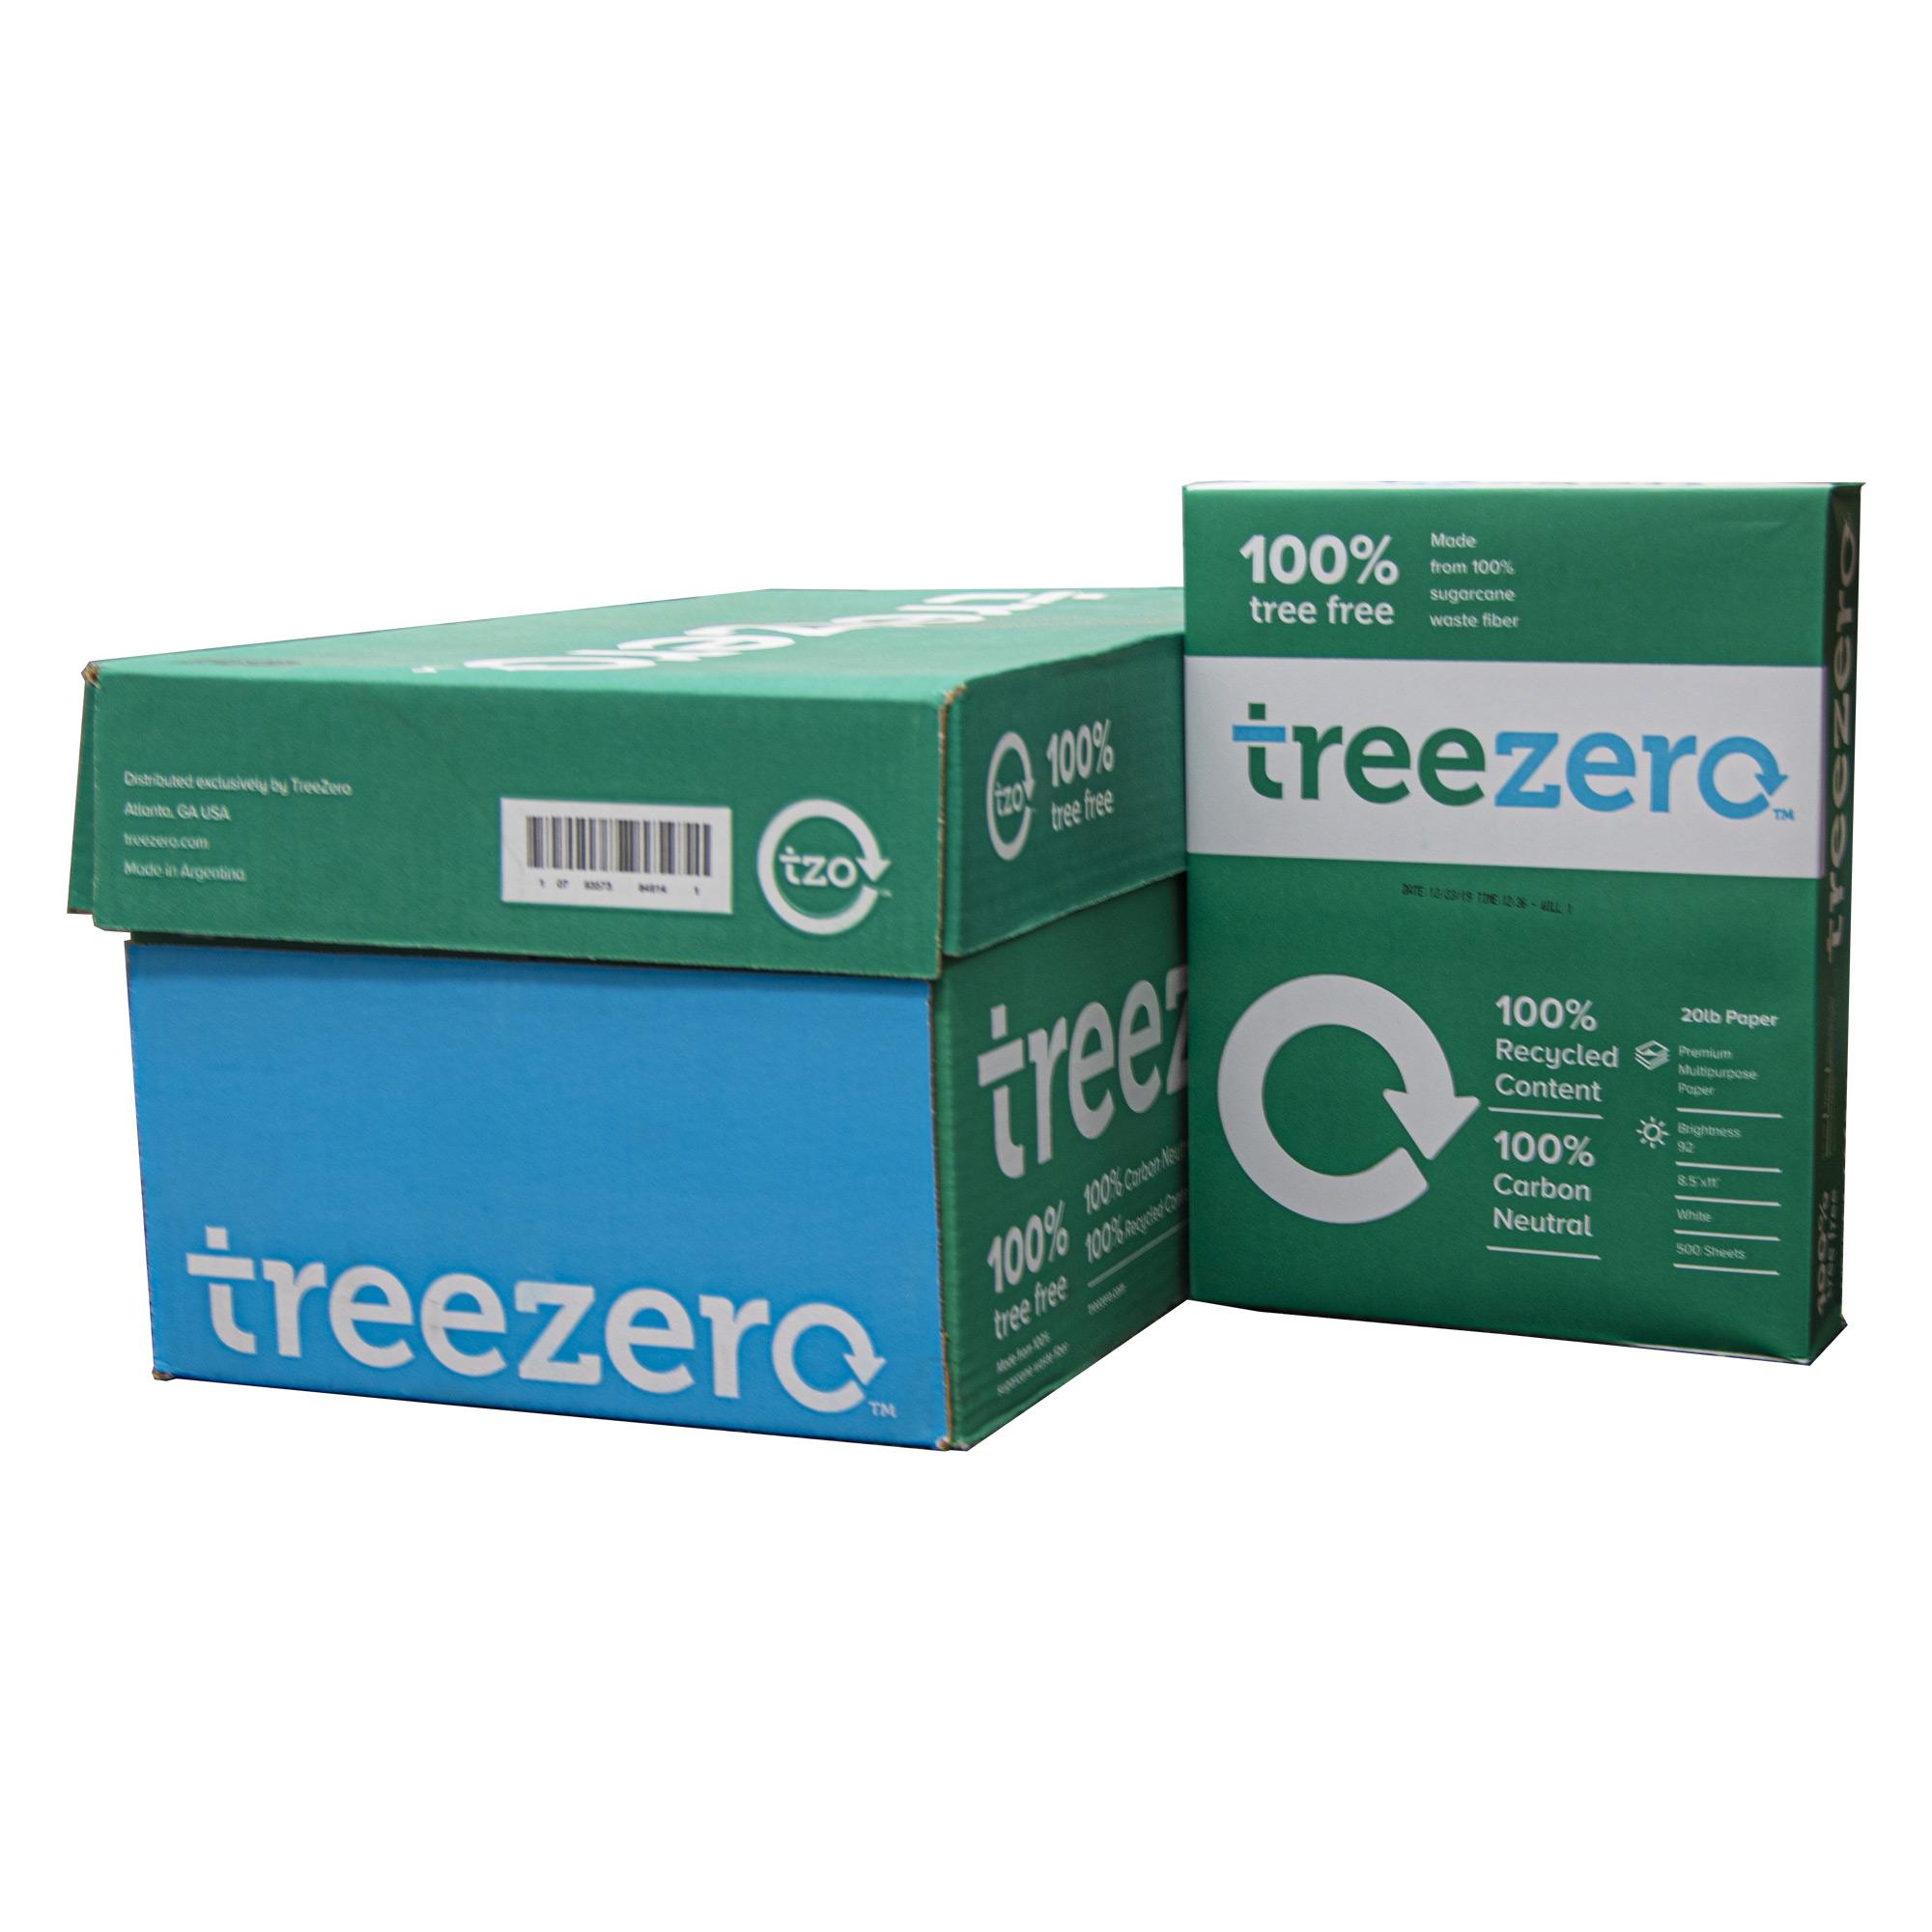 TREE ZERO (92) 8.5″ X 11″ White Copy Paper (10 Reams/Case)